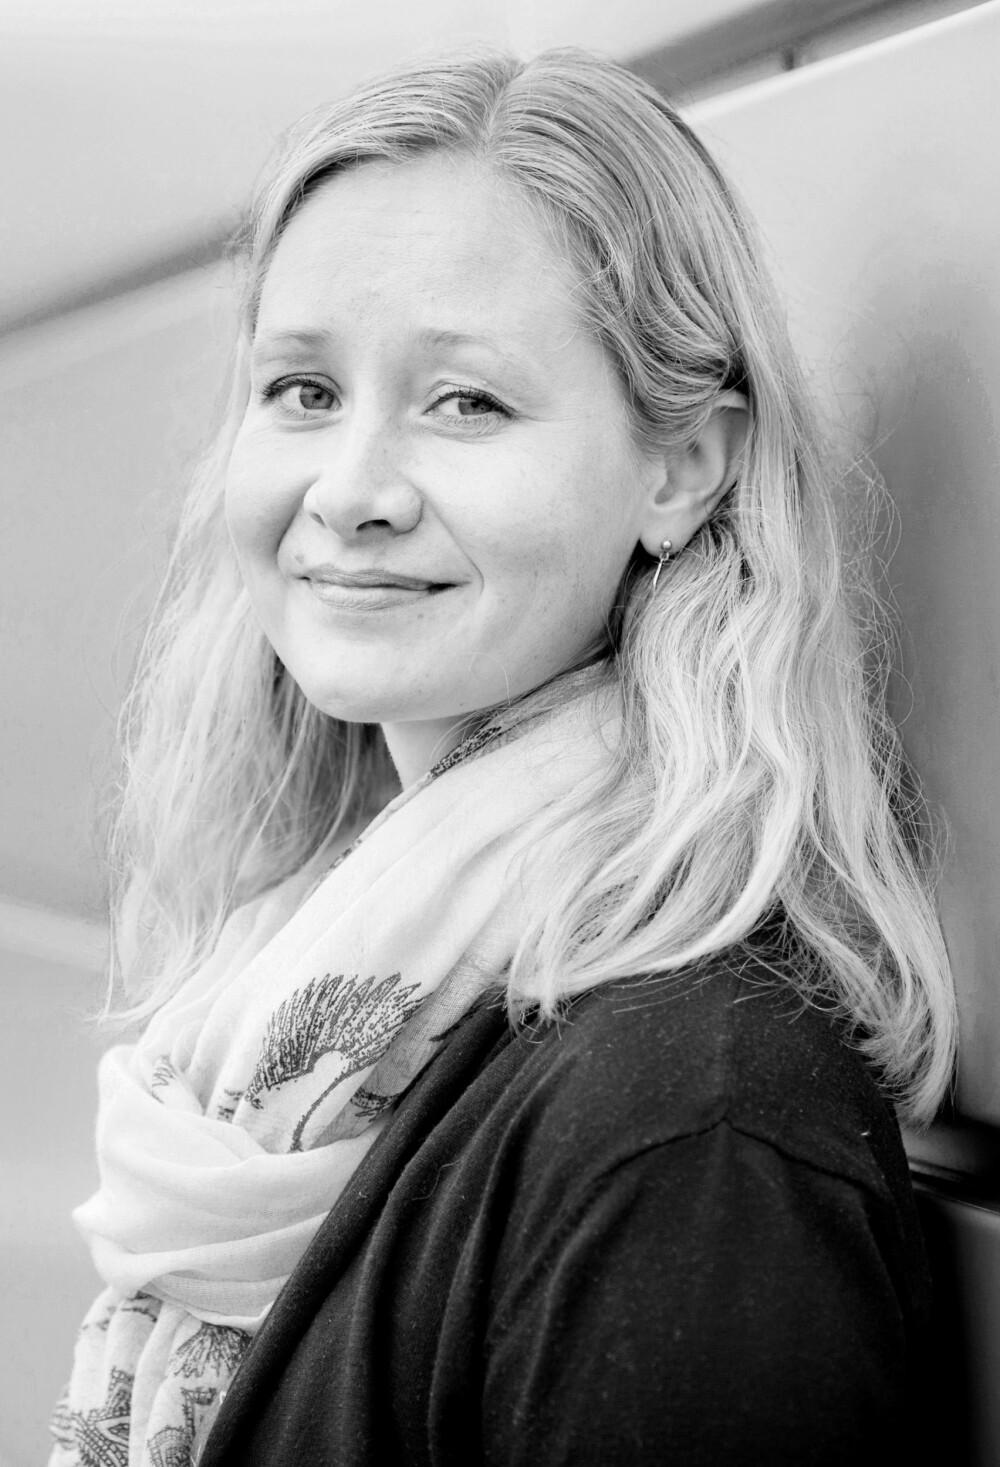 EKSPERT: Åshild Lappegard Hauge er miljøpsykolog og seniorforsker ved SINTEF Byggforsk.